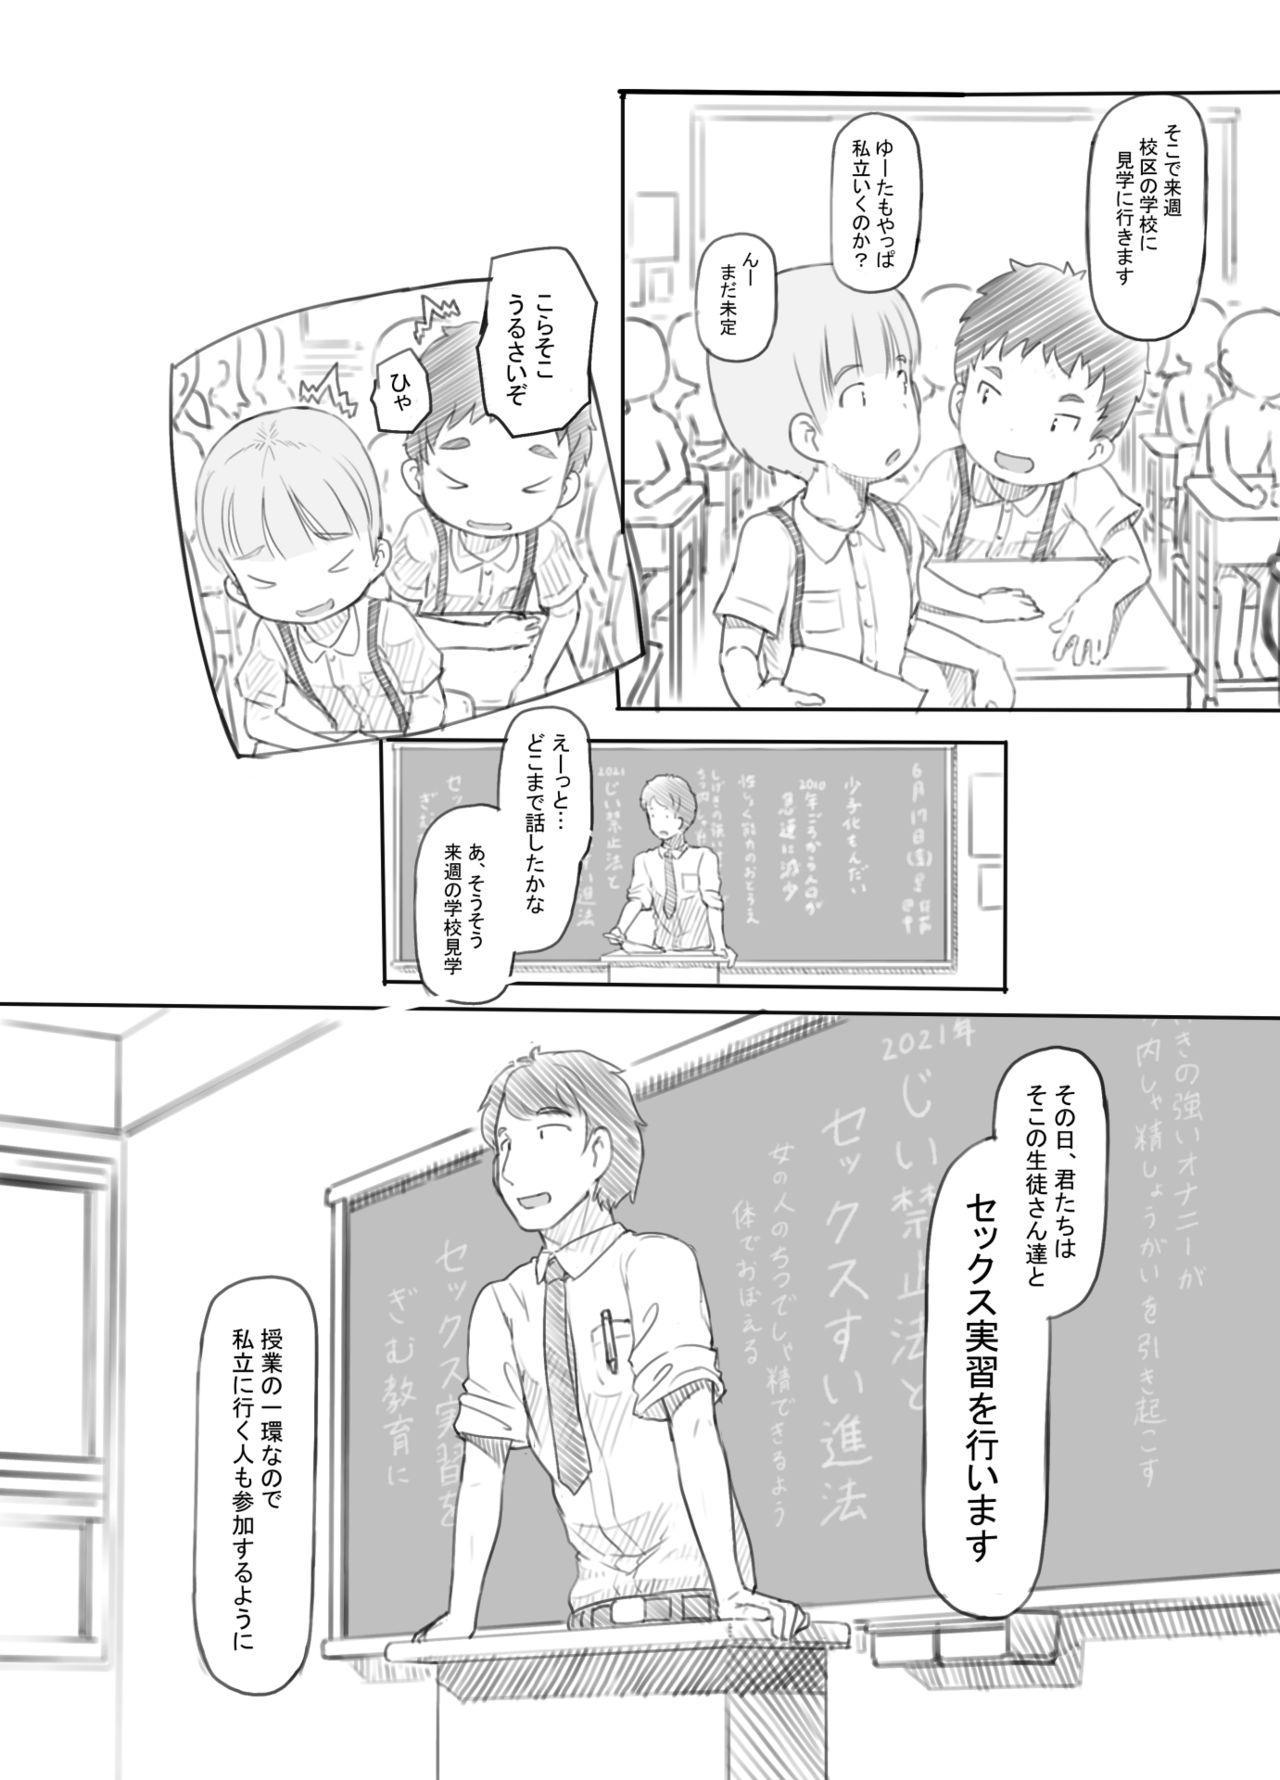 OneShota Sex Jisshuu 2